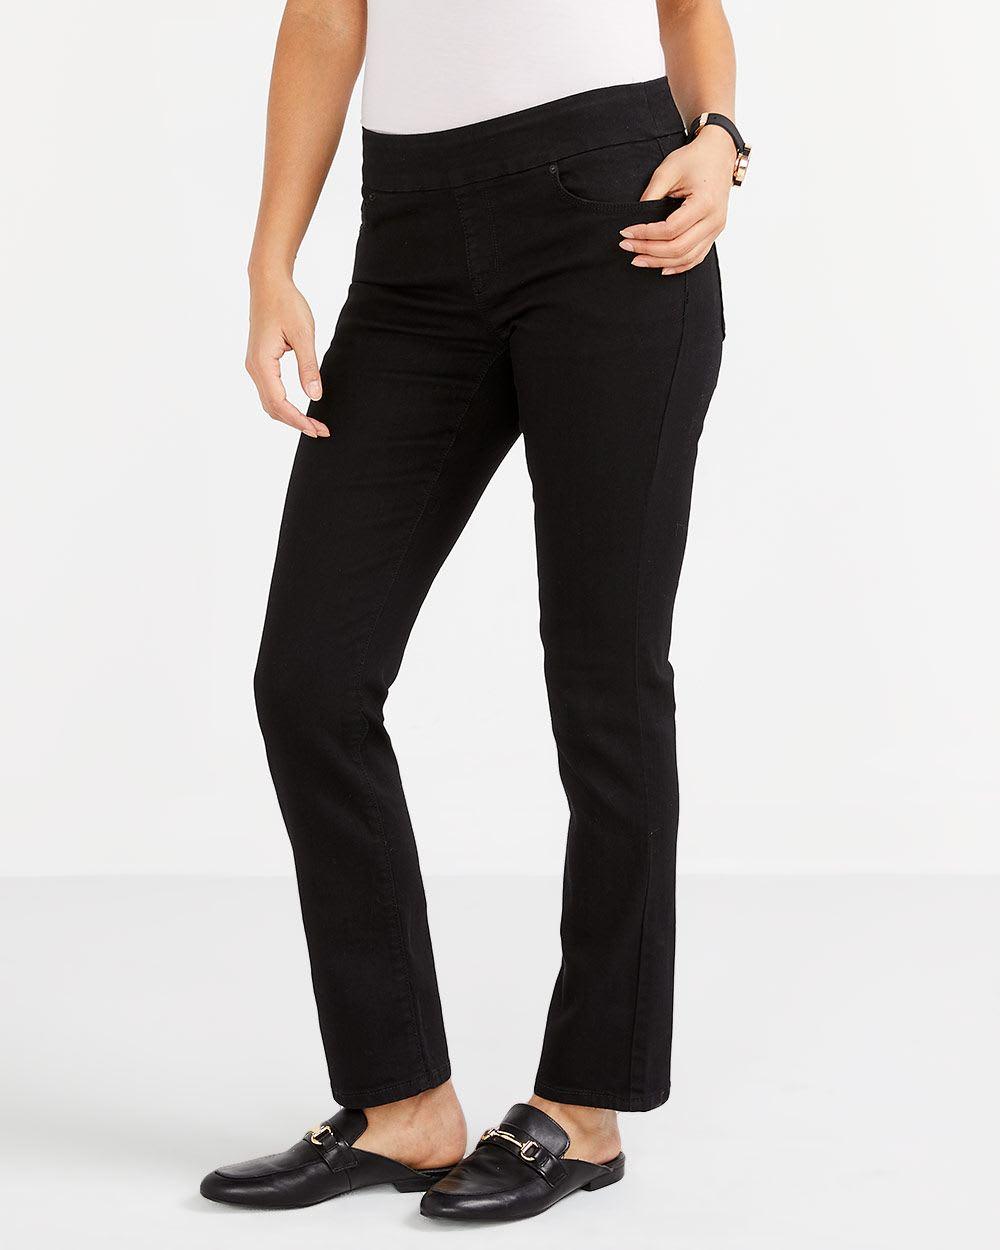 The Petite Original Comfort Black Jeans